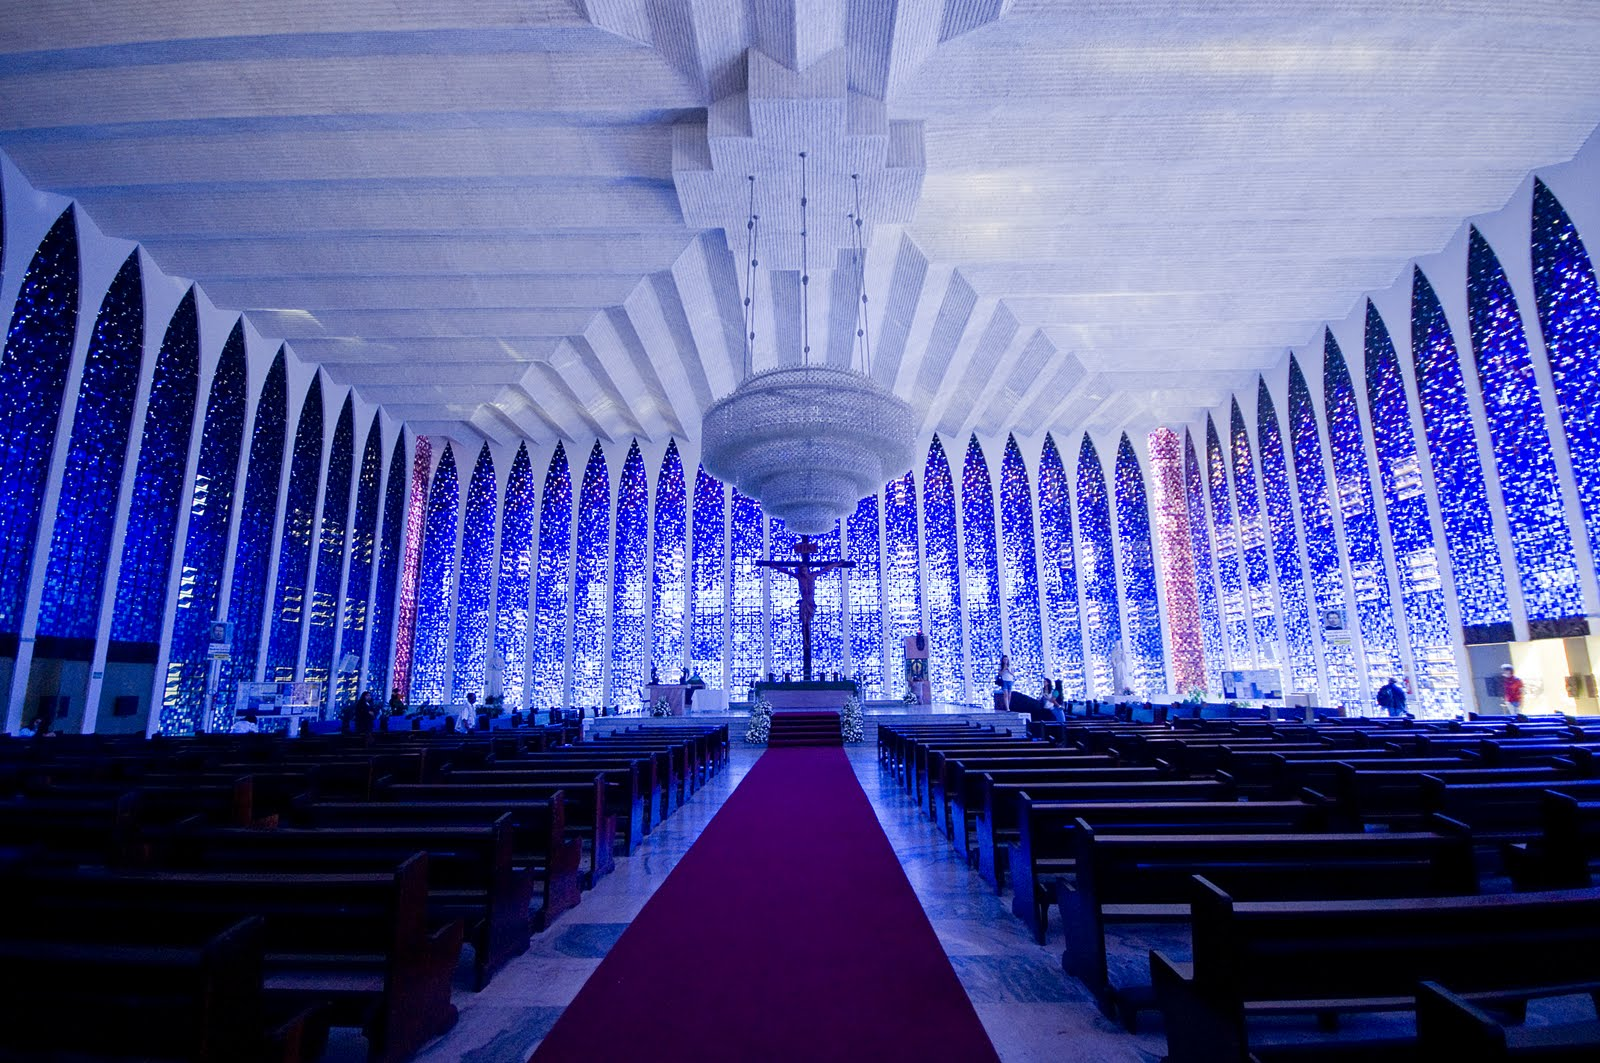 Catolica brasilia